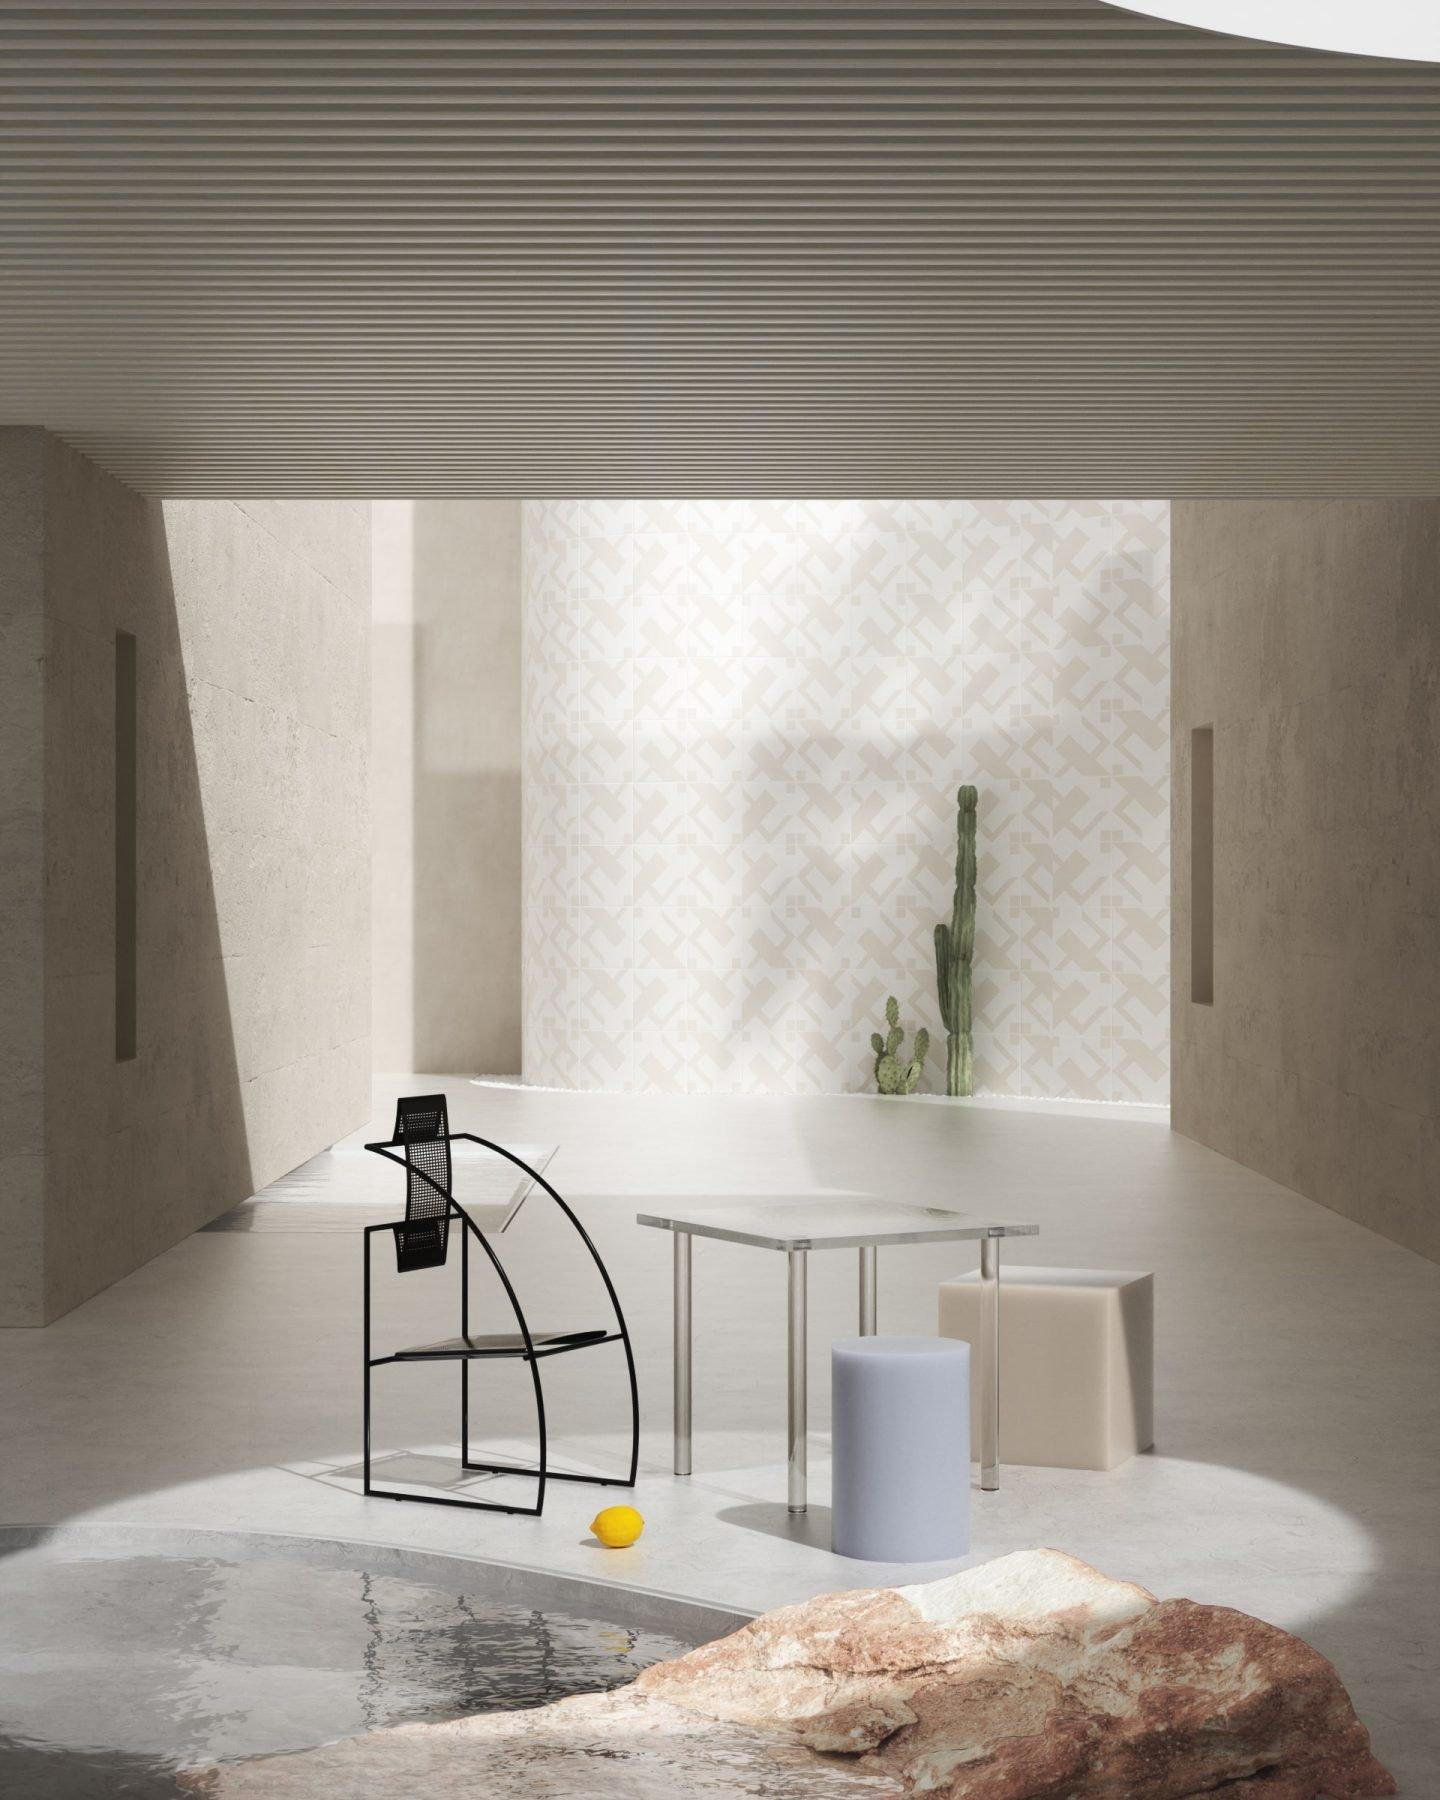 IGNANT-Design-CharlotteTaylor-16